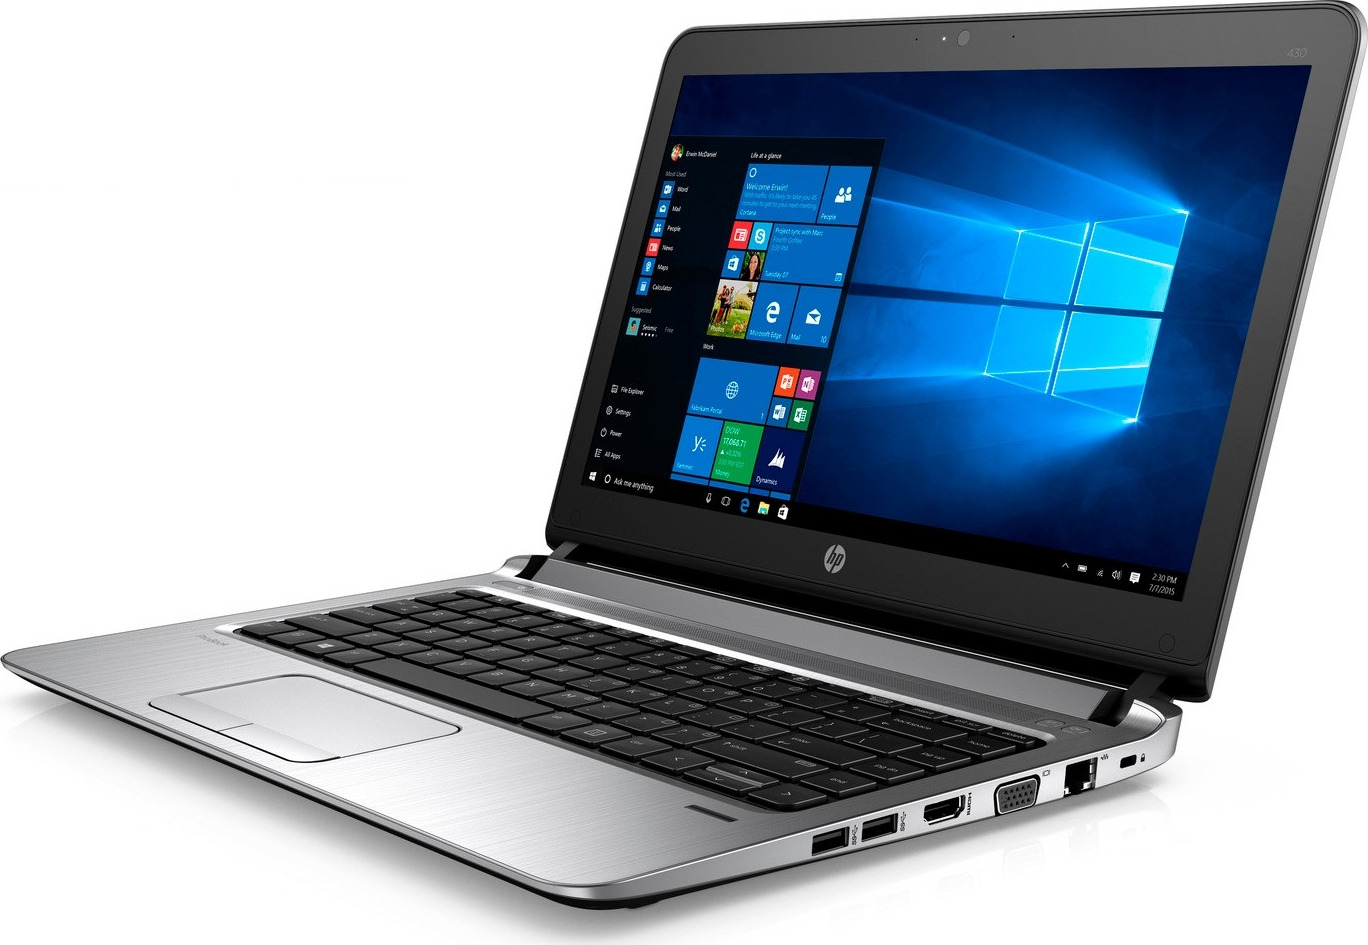 13.3 Ноутбук HP ProBook 430 G3 3QL32EA, черный ноутбук hp probook 450 g3